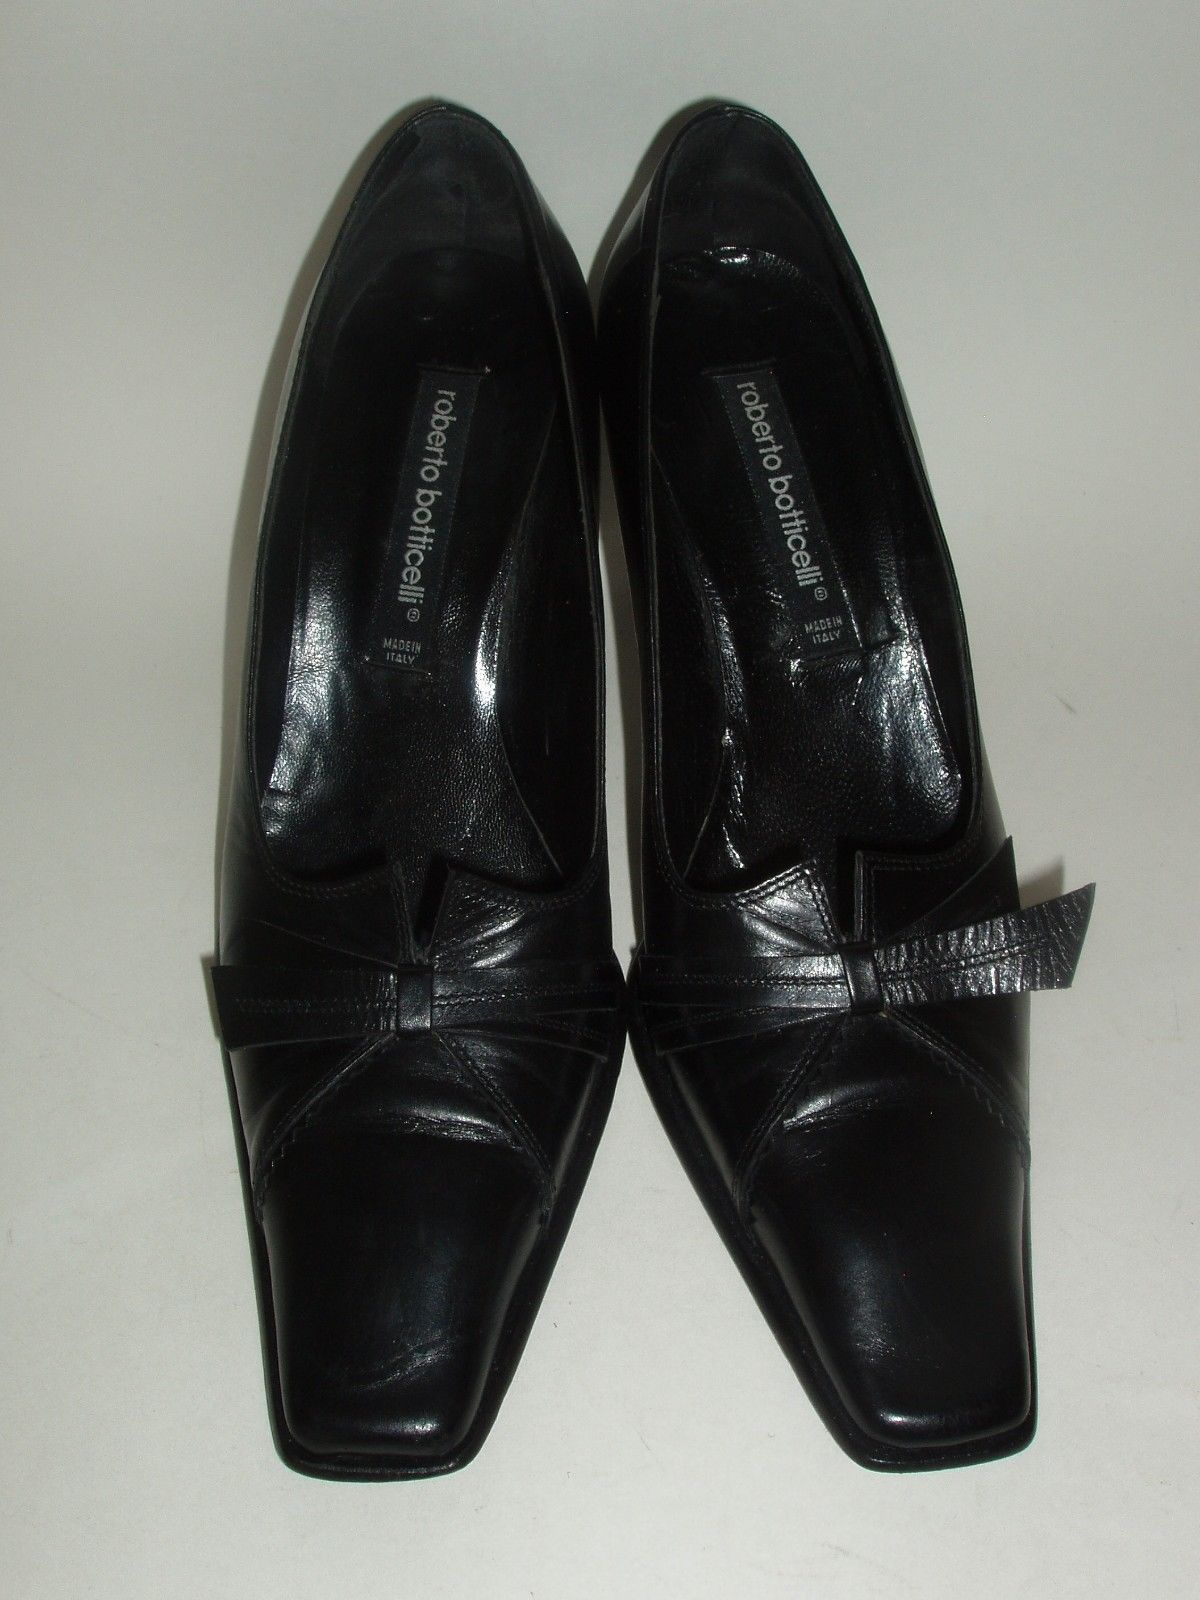 Roberto Botticelli Italian Made Black Leather High Heel Shoes Euro 37.5 US 7.5 image 2